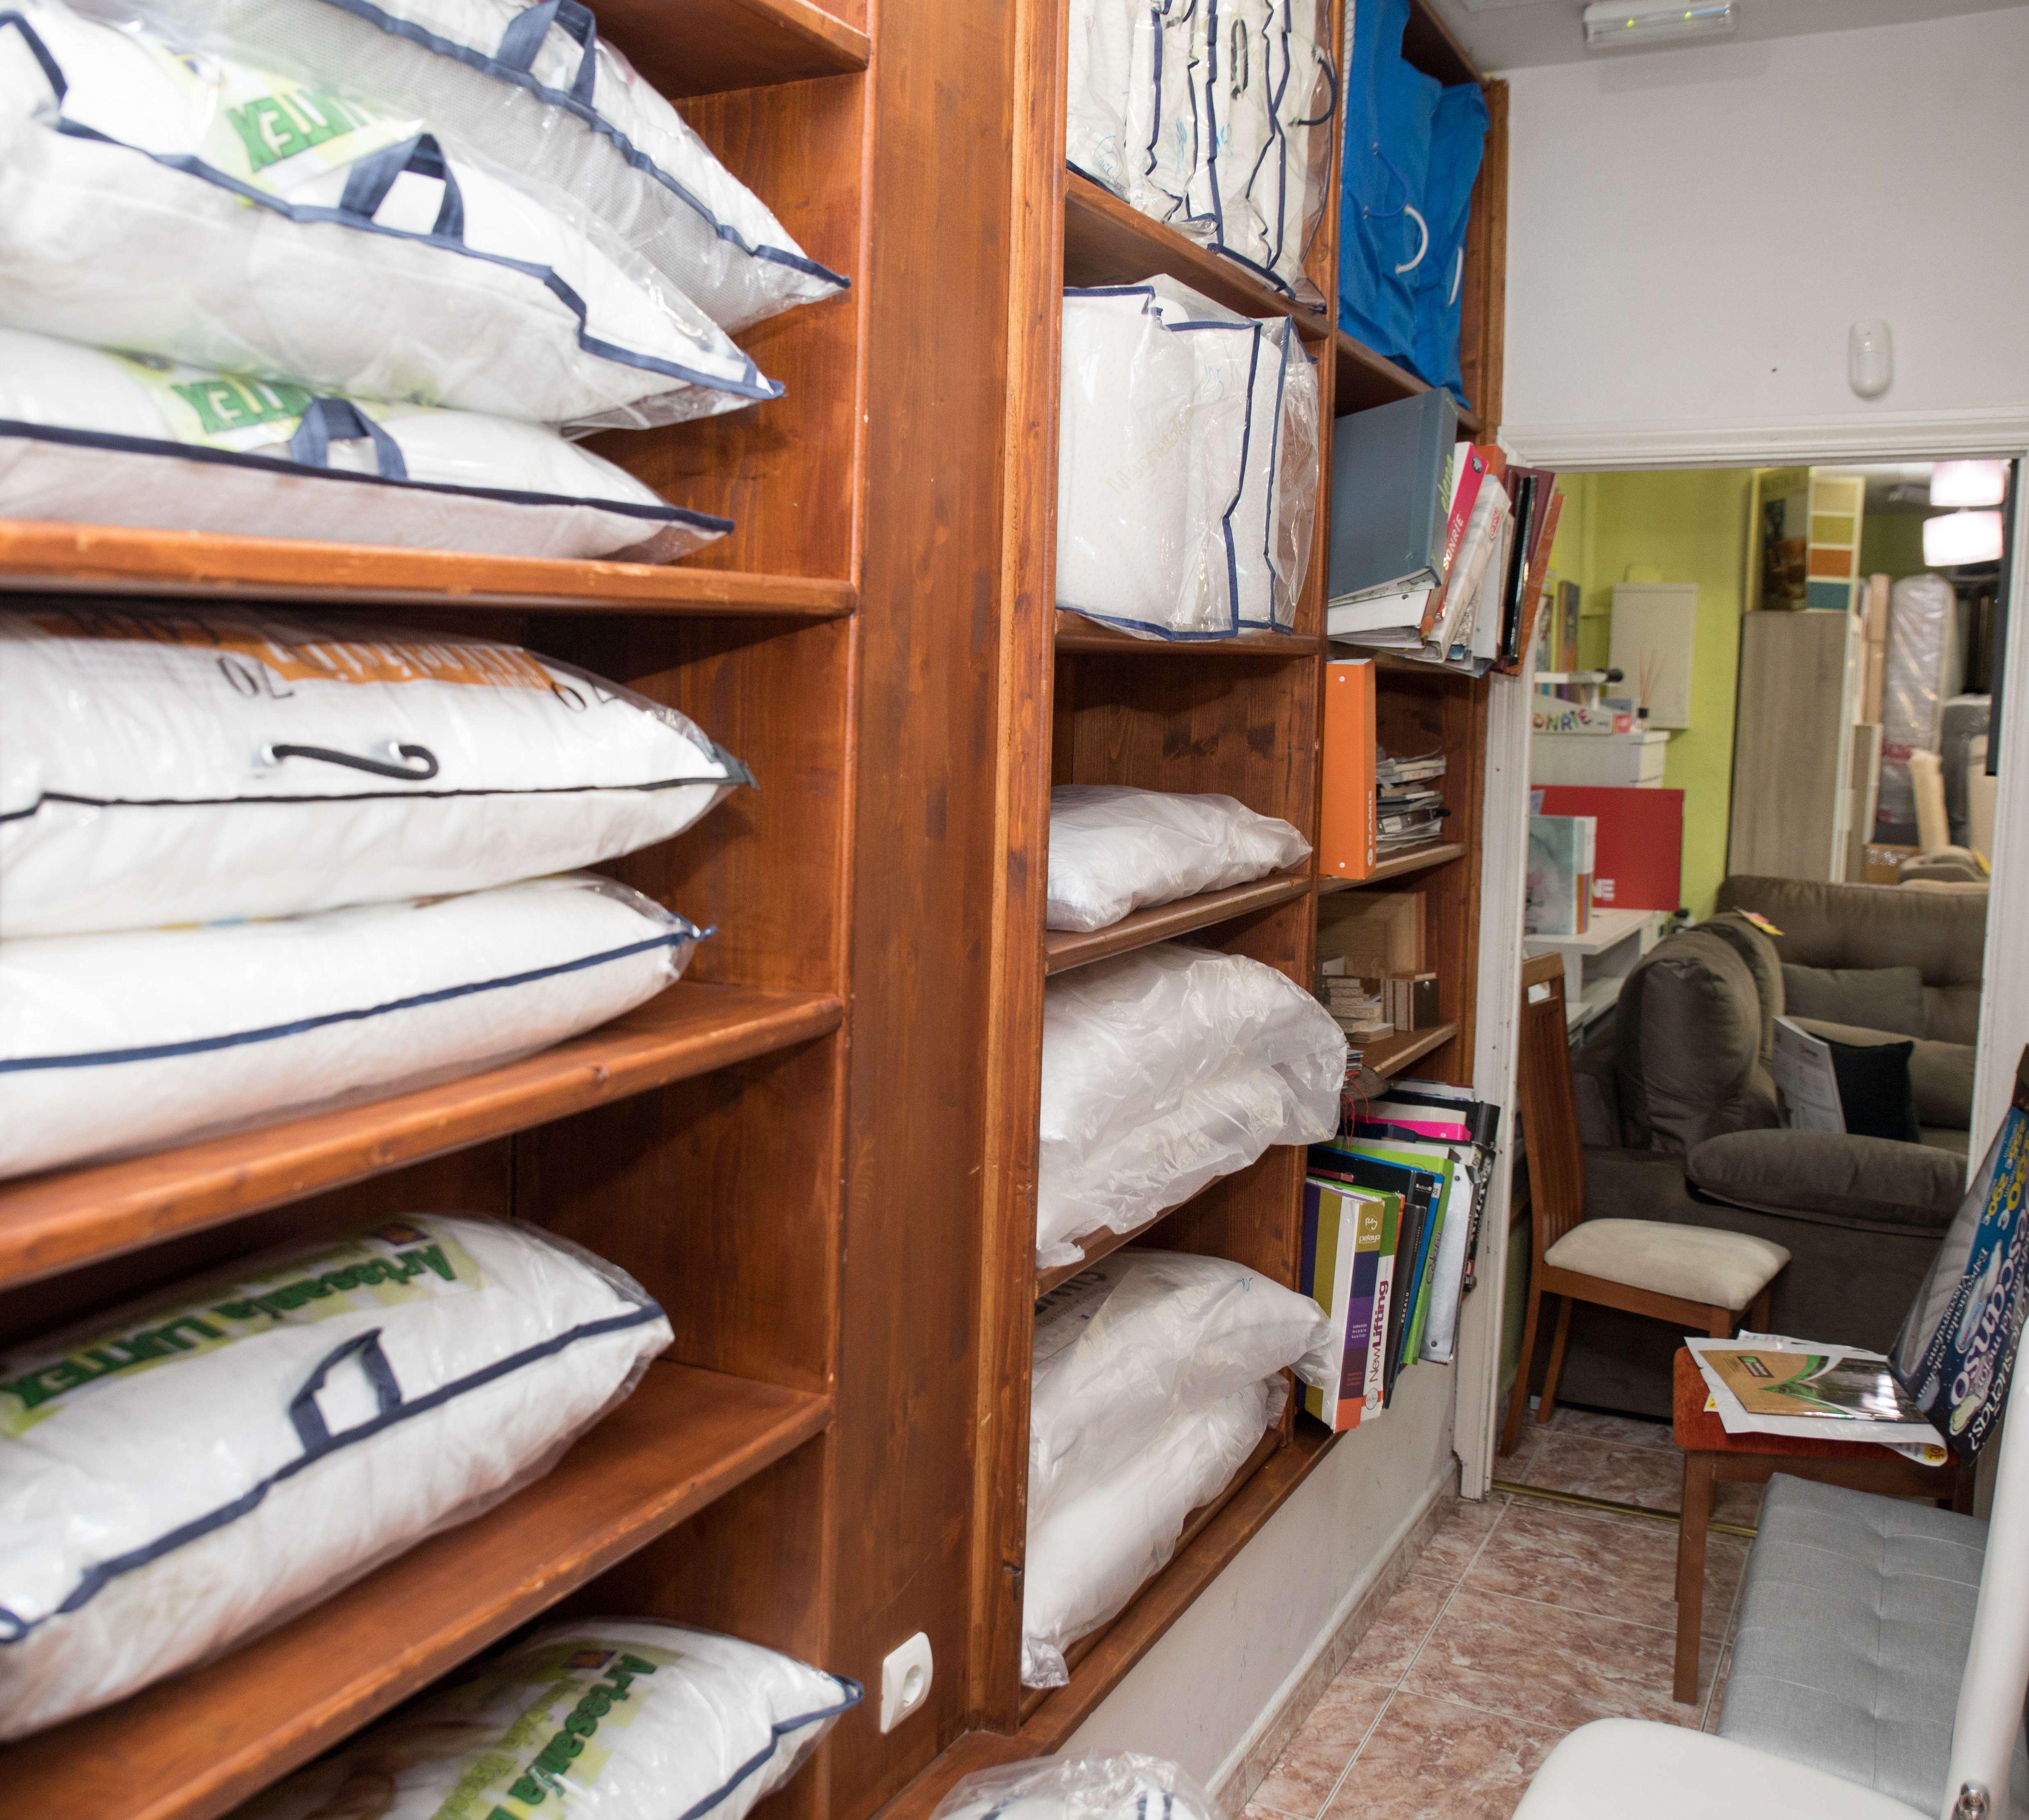 Amplio catálogo de accesorios para el descanso como almohadas